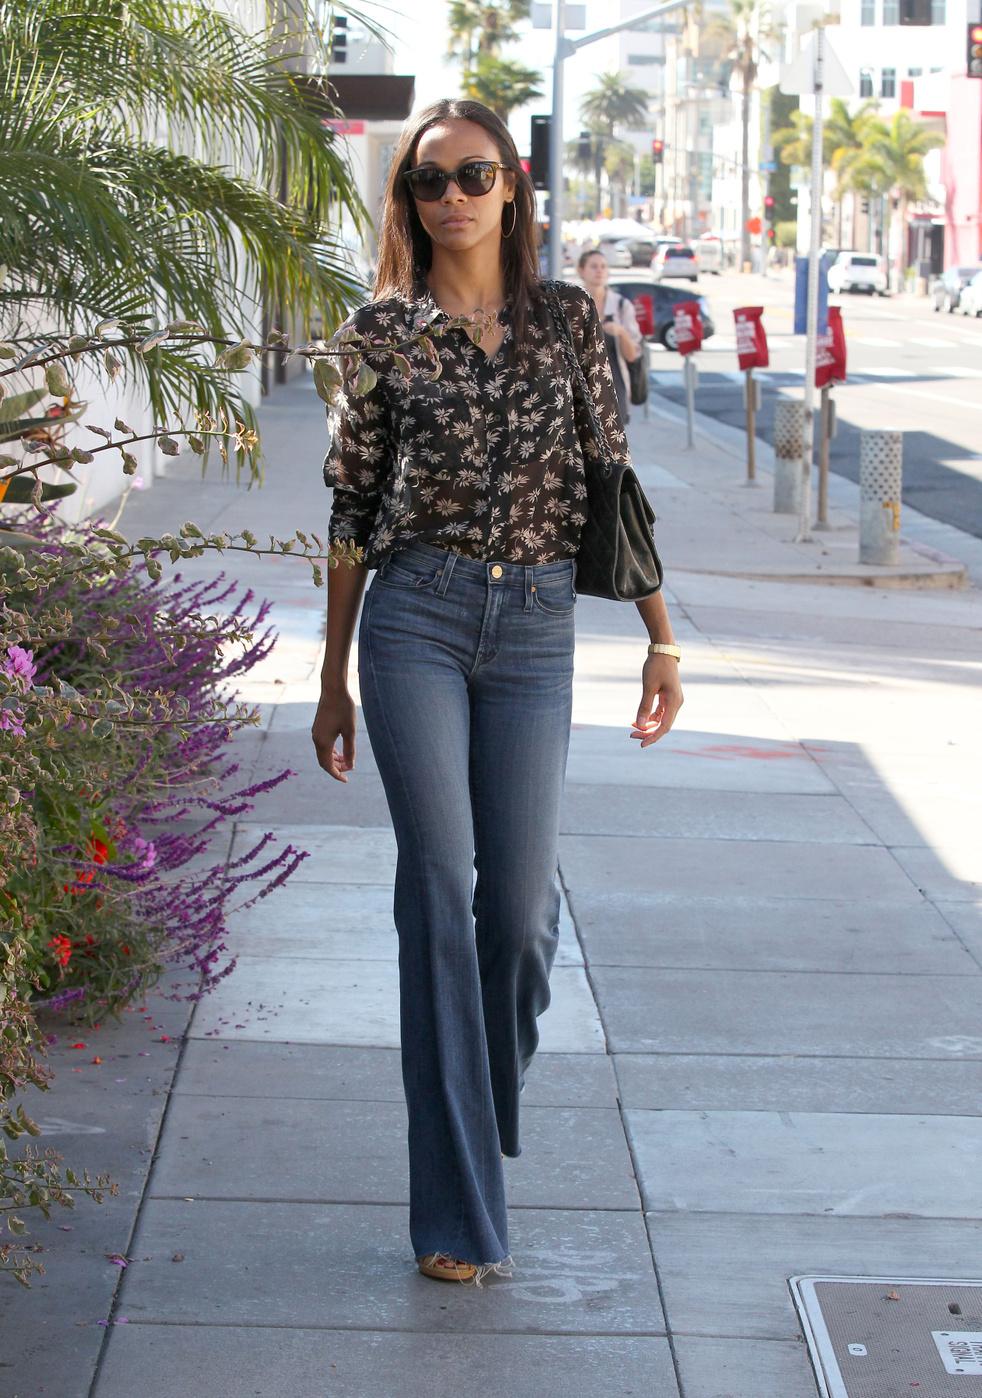 Zoe Saldana heads out on errands around Los Angeles